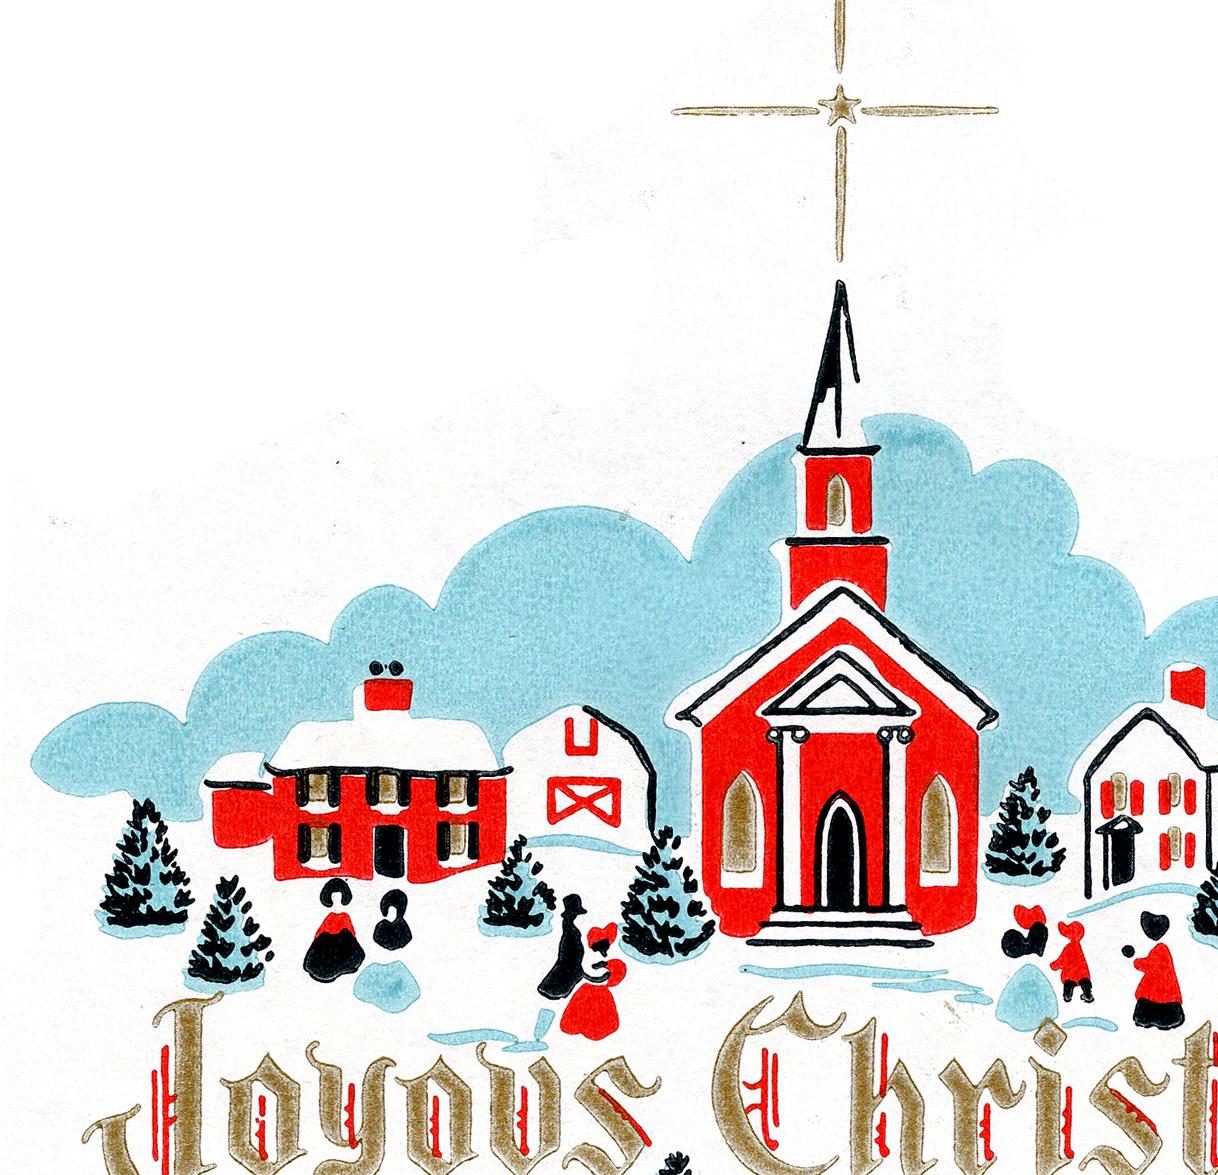 Christmas church clipart free jpg transparent library Free Christmas Church Cliparts, Download Free Clip Art, Free Clip ... jpg transparent library